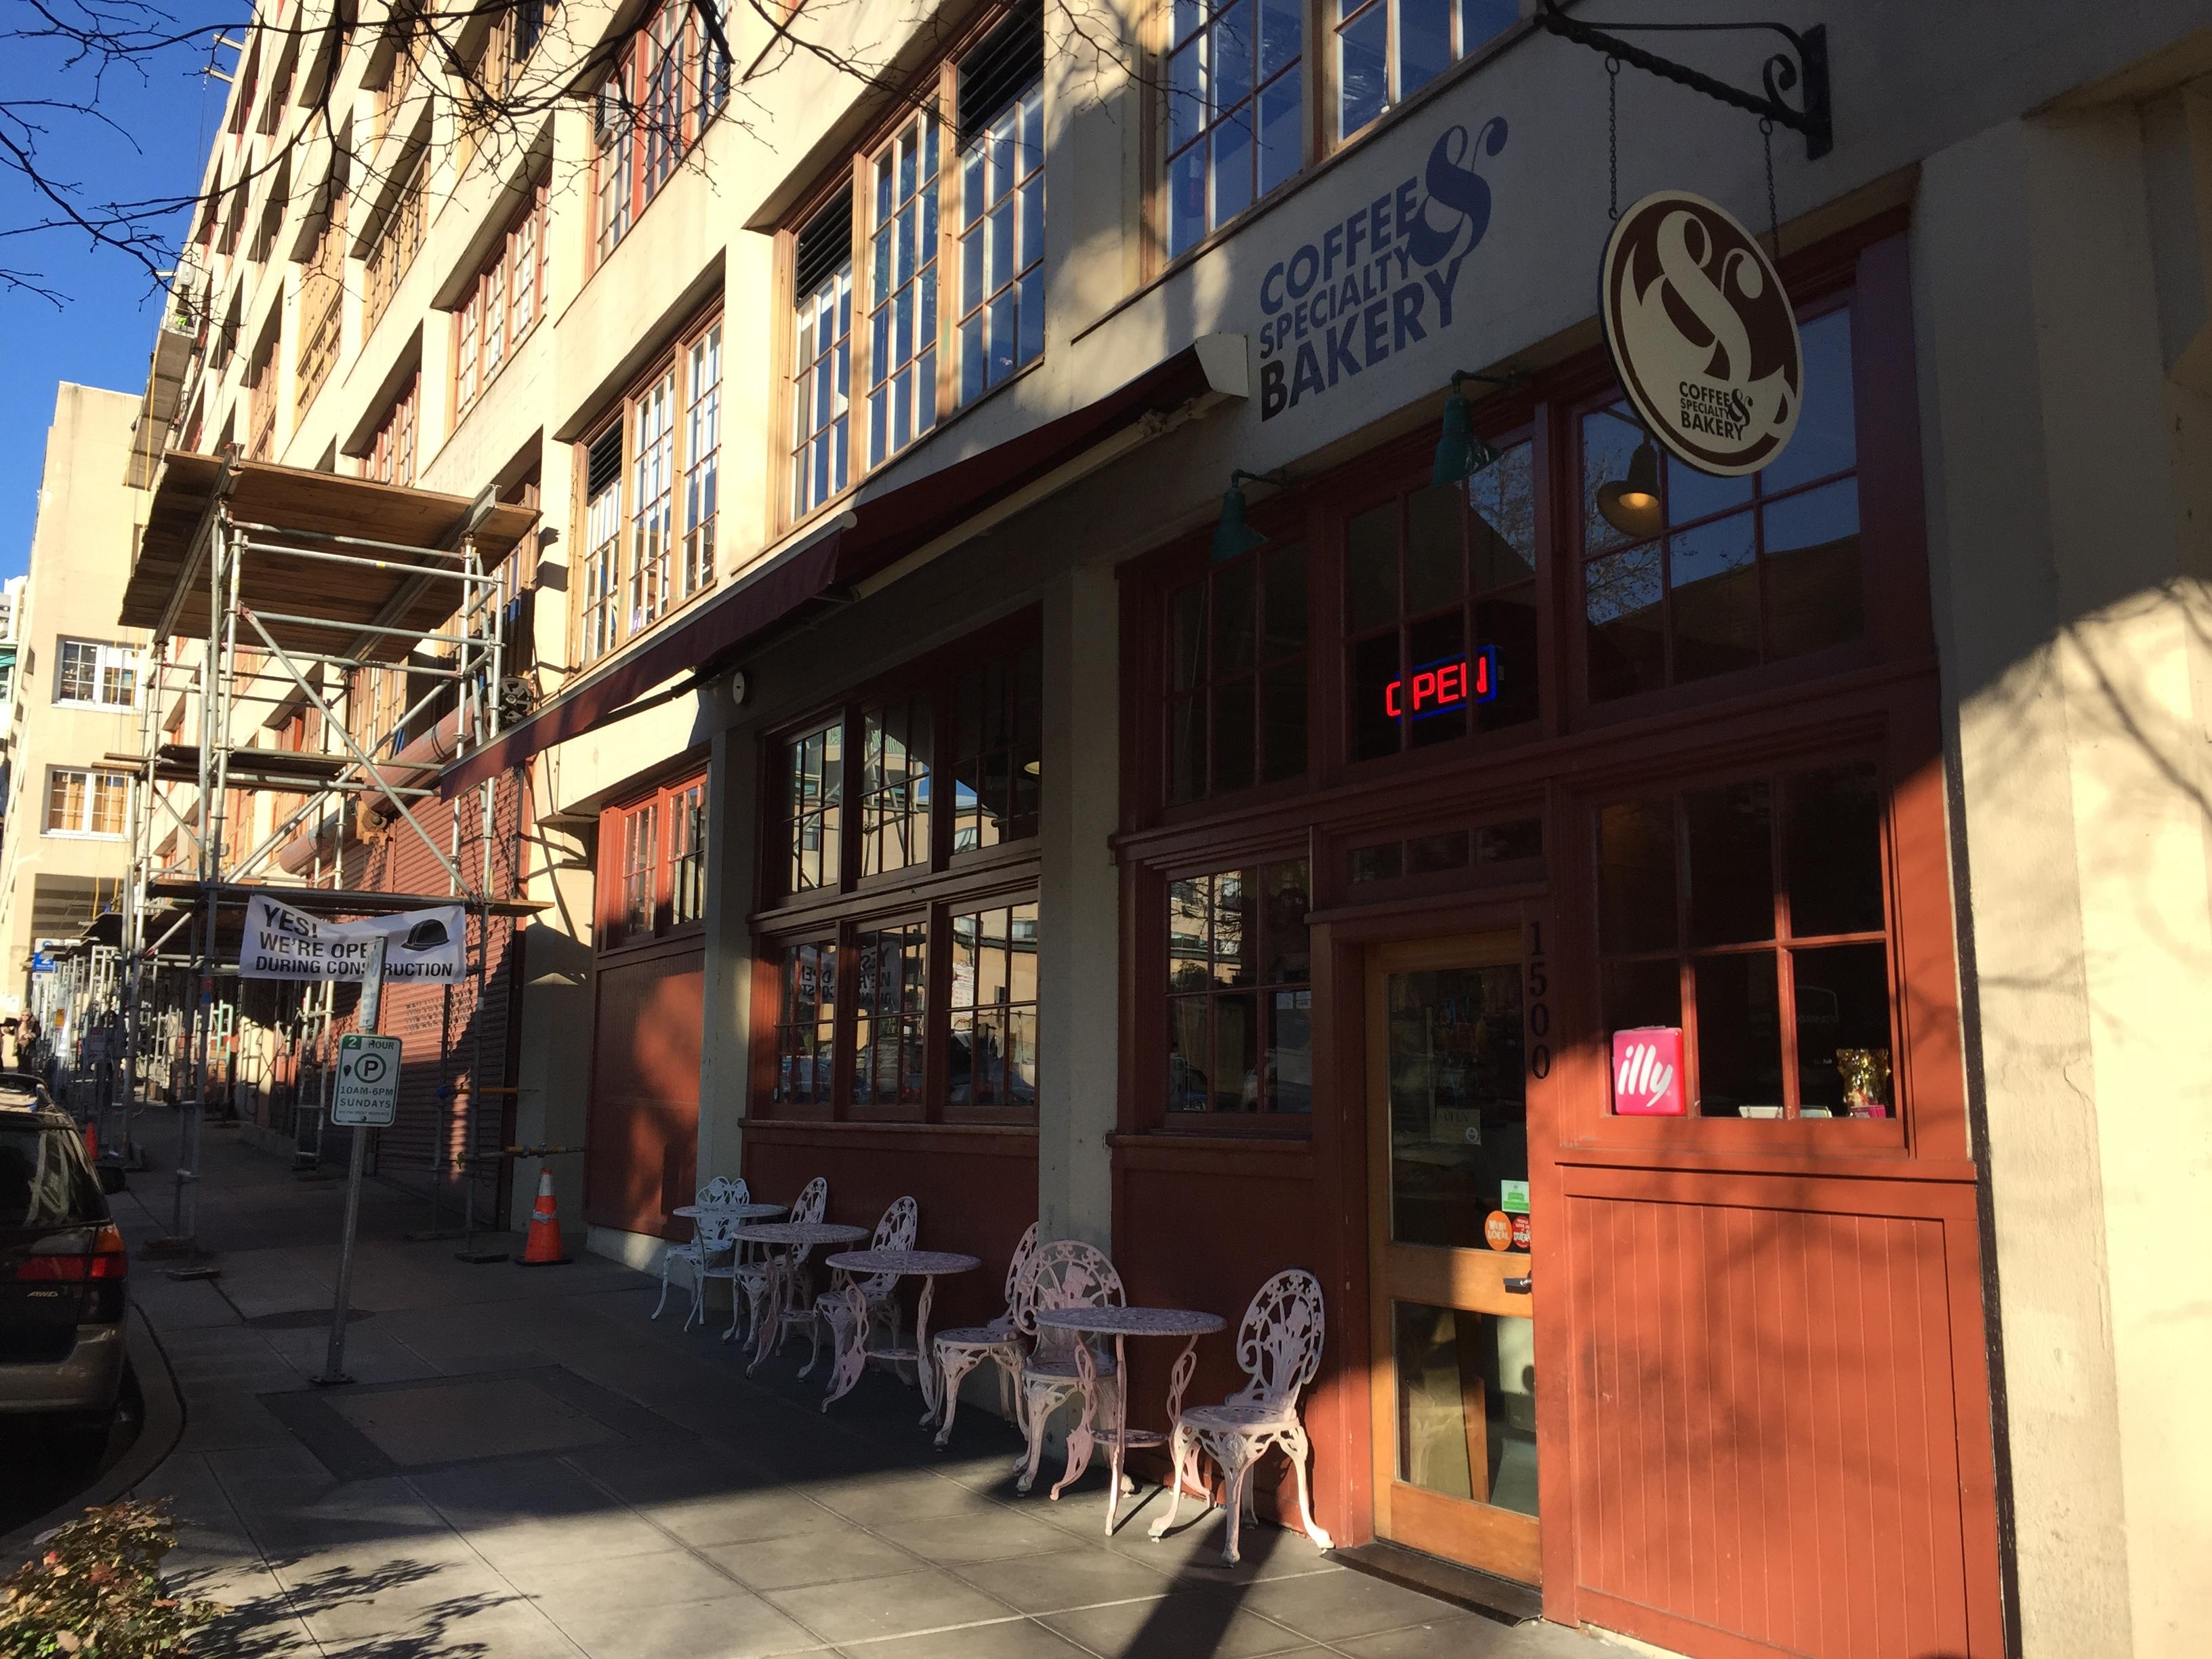 Coffee & Specialty Bakery